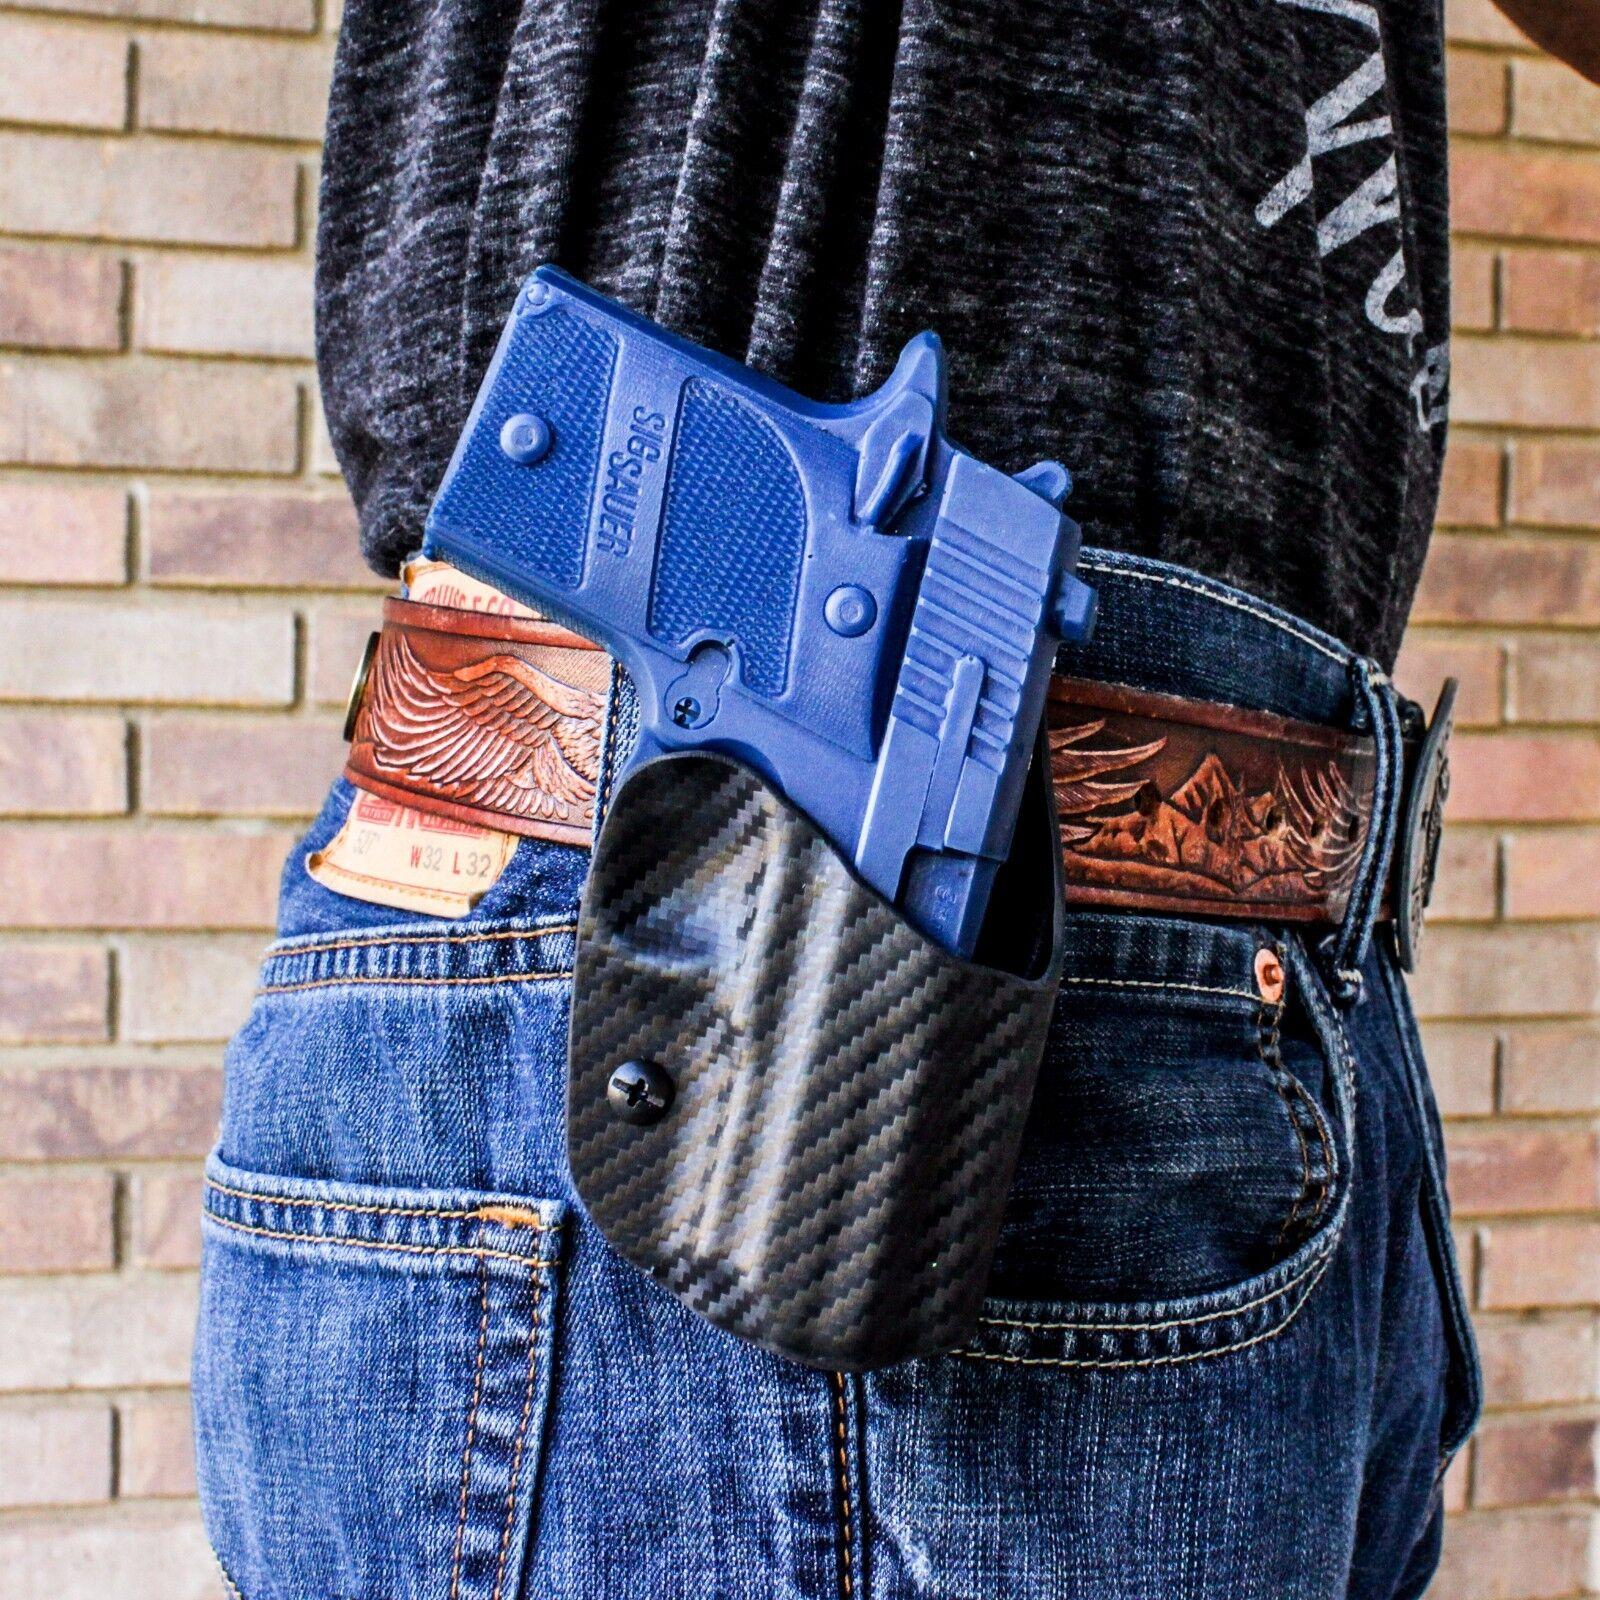 GMI Holsters - - Holsters The Demon Holster (Choose gun model ) 588dc7